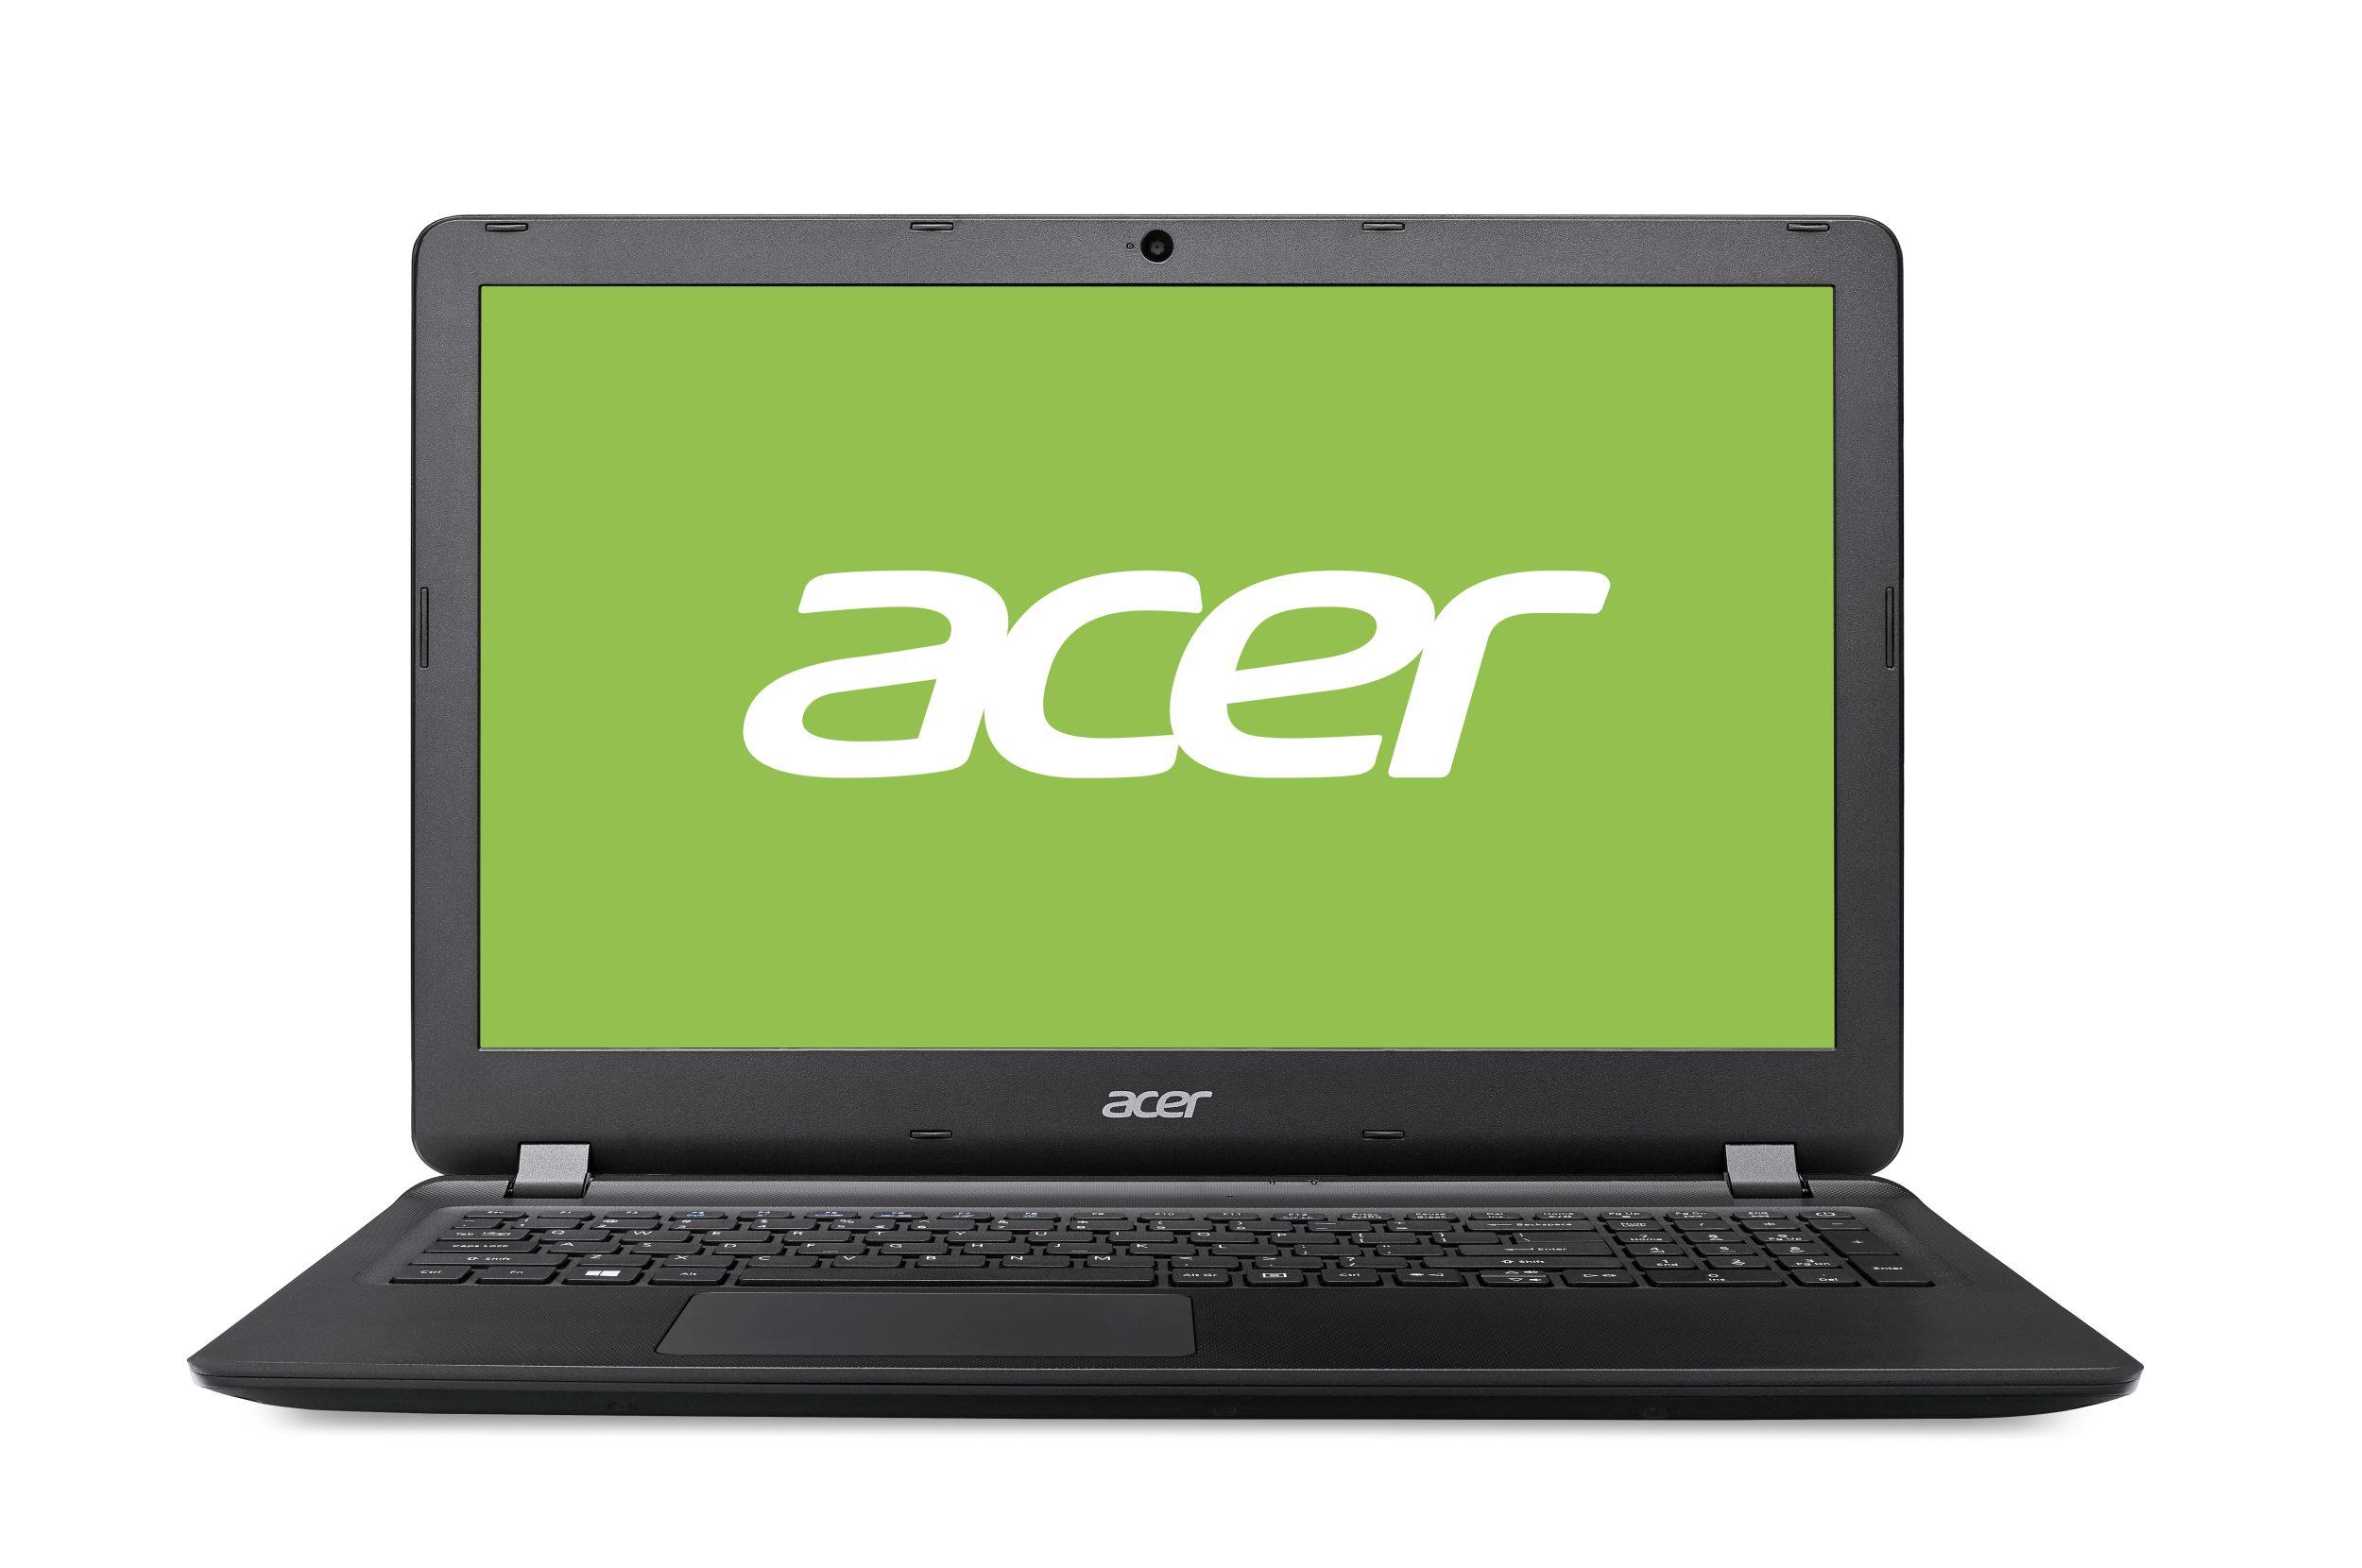 "Acer Extensa 15 (EX2540-32K5) i3-6006U/4 GB+N/256 GB SSD+N/DVDRW/HD Graphics/15.6"" FHD matný LED/BT/W10 Pro/Black"